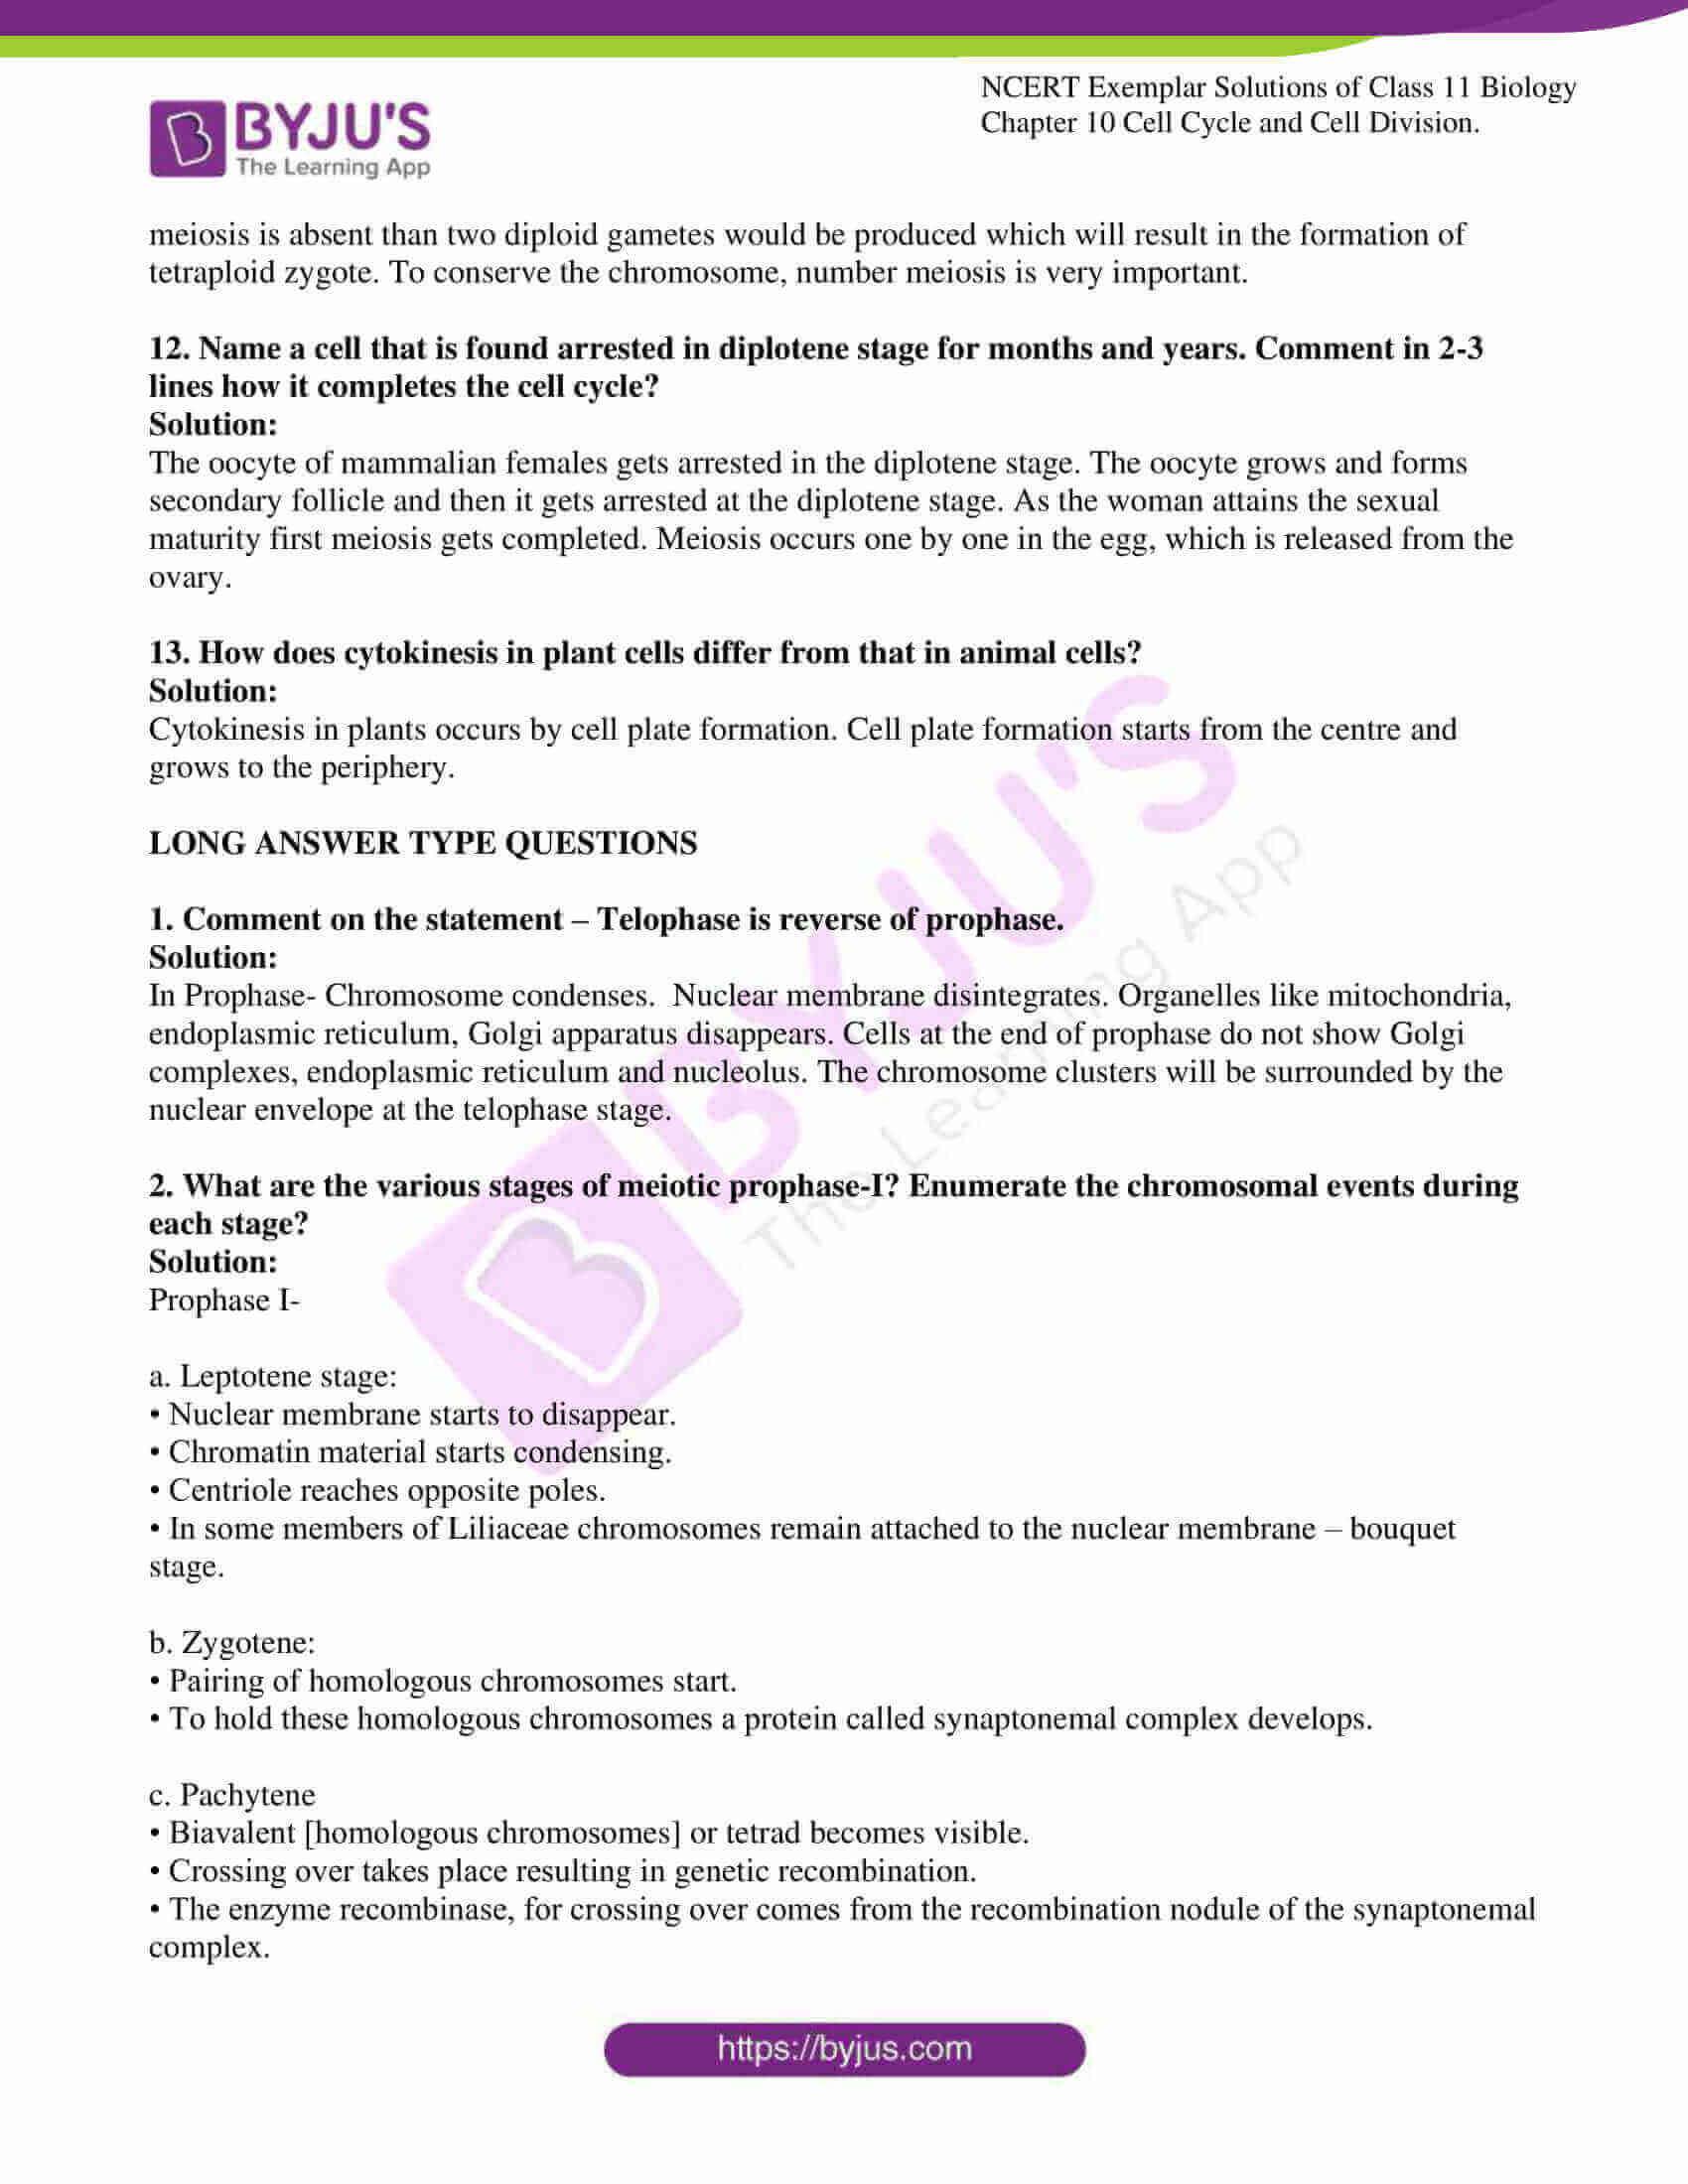 ncert exemplar solutions for class 11 bio chapter 10 7